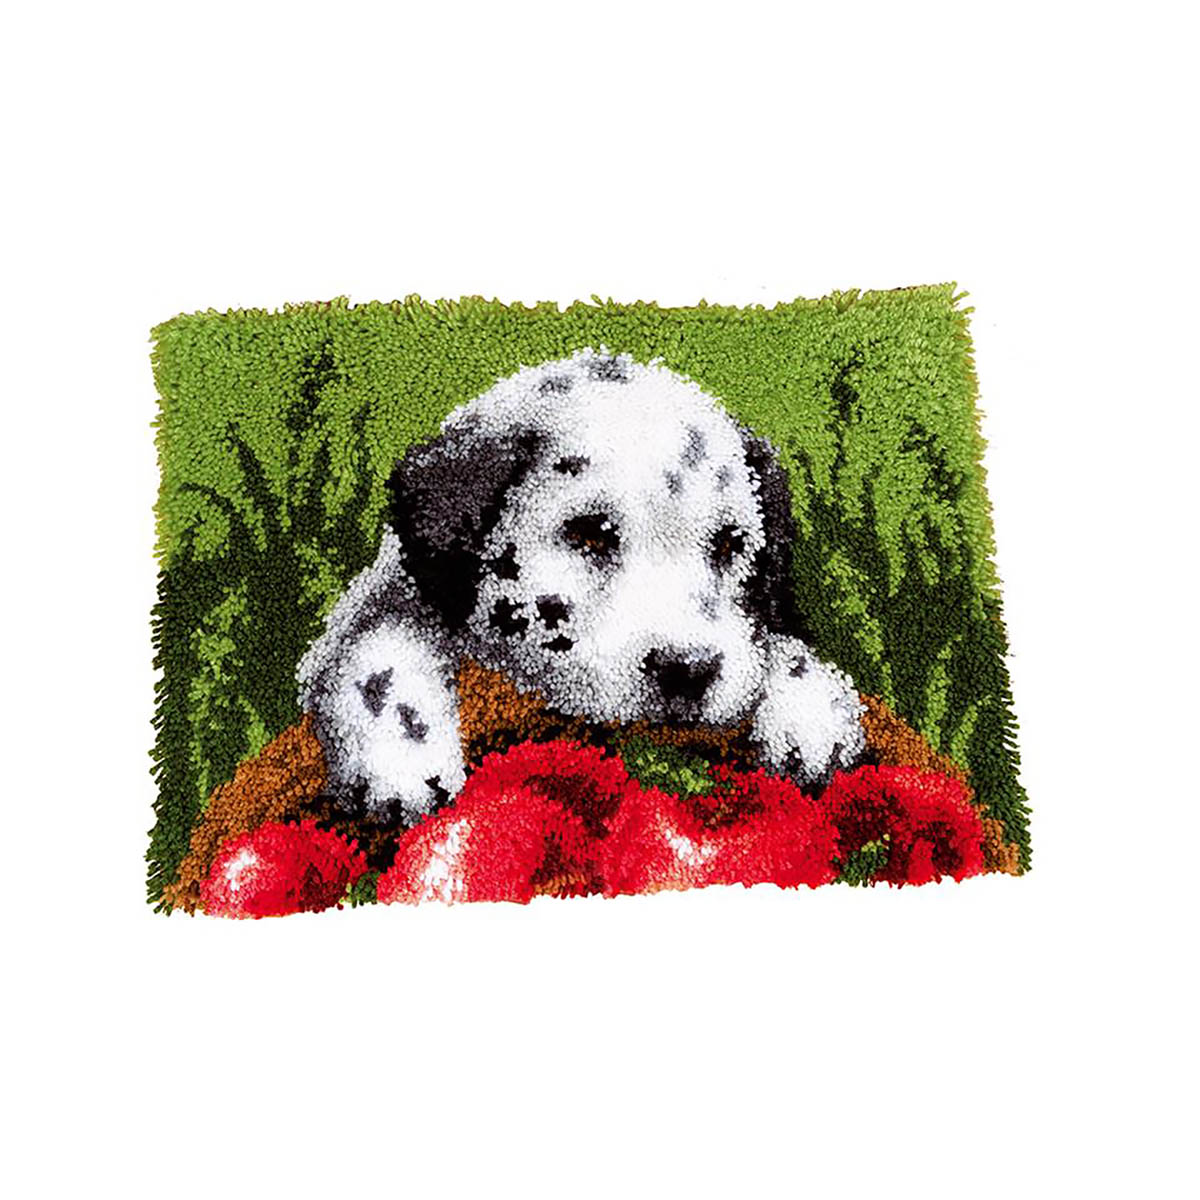 0147231-PN Коврик (ковровая техника) Vervaco 'Далматинец с яблоками' 40x40 см